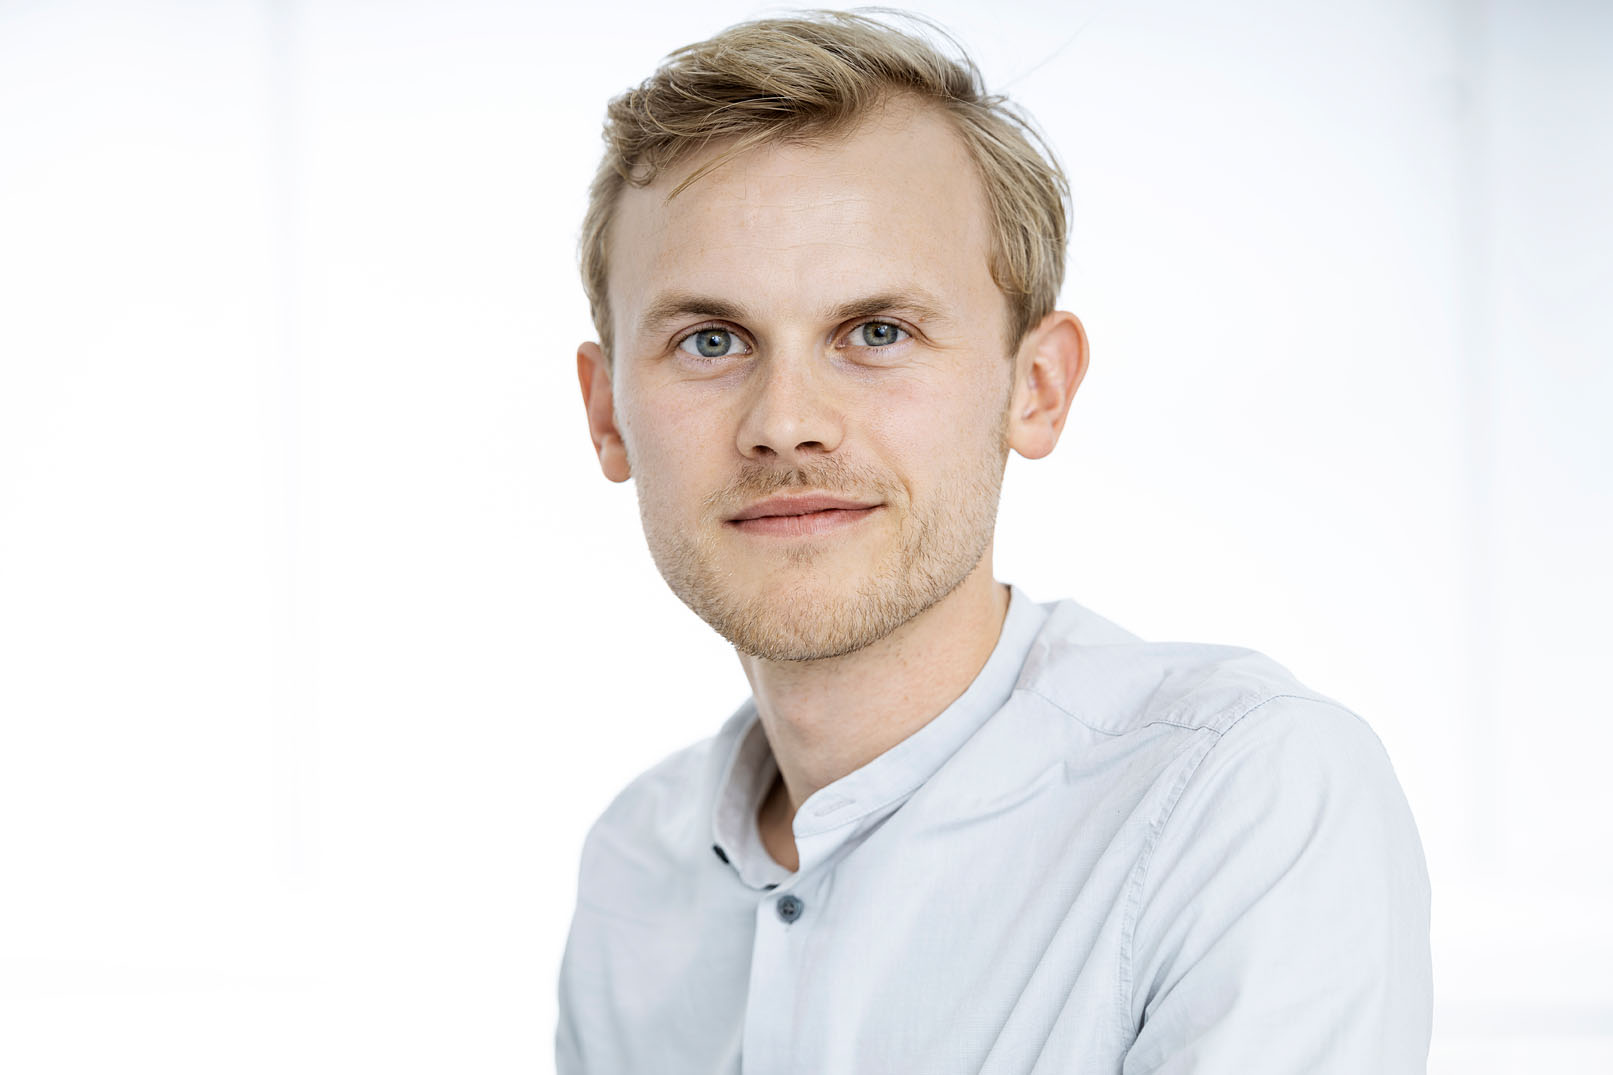 Peter Aske Svendsen